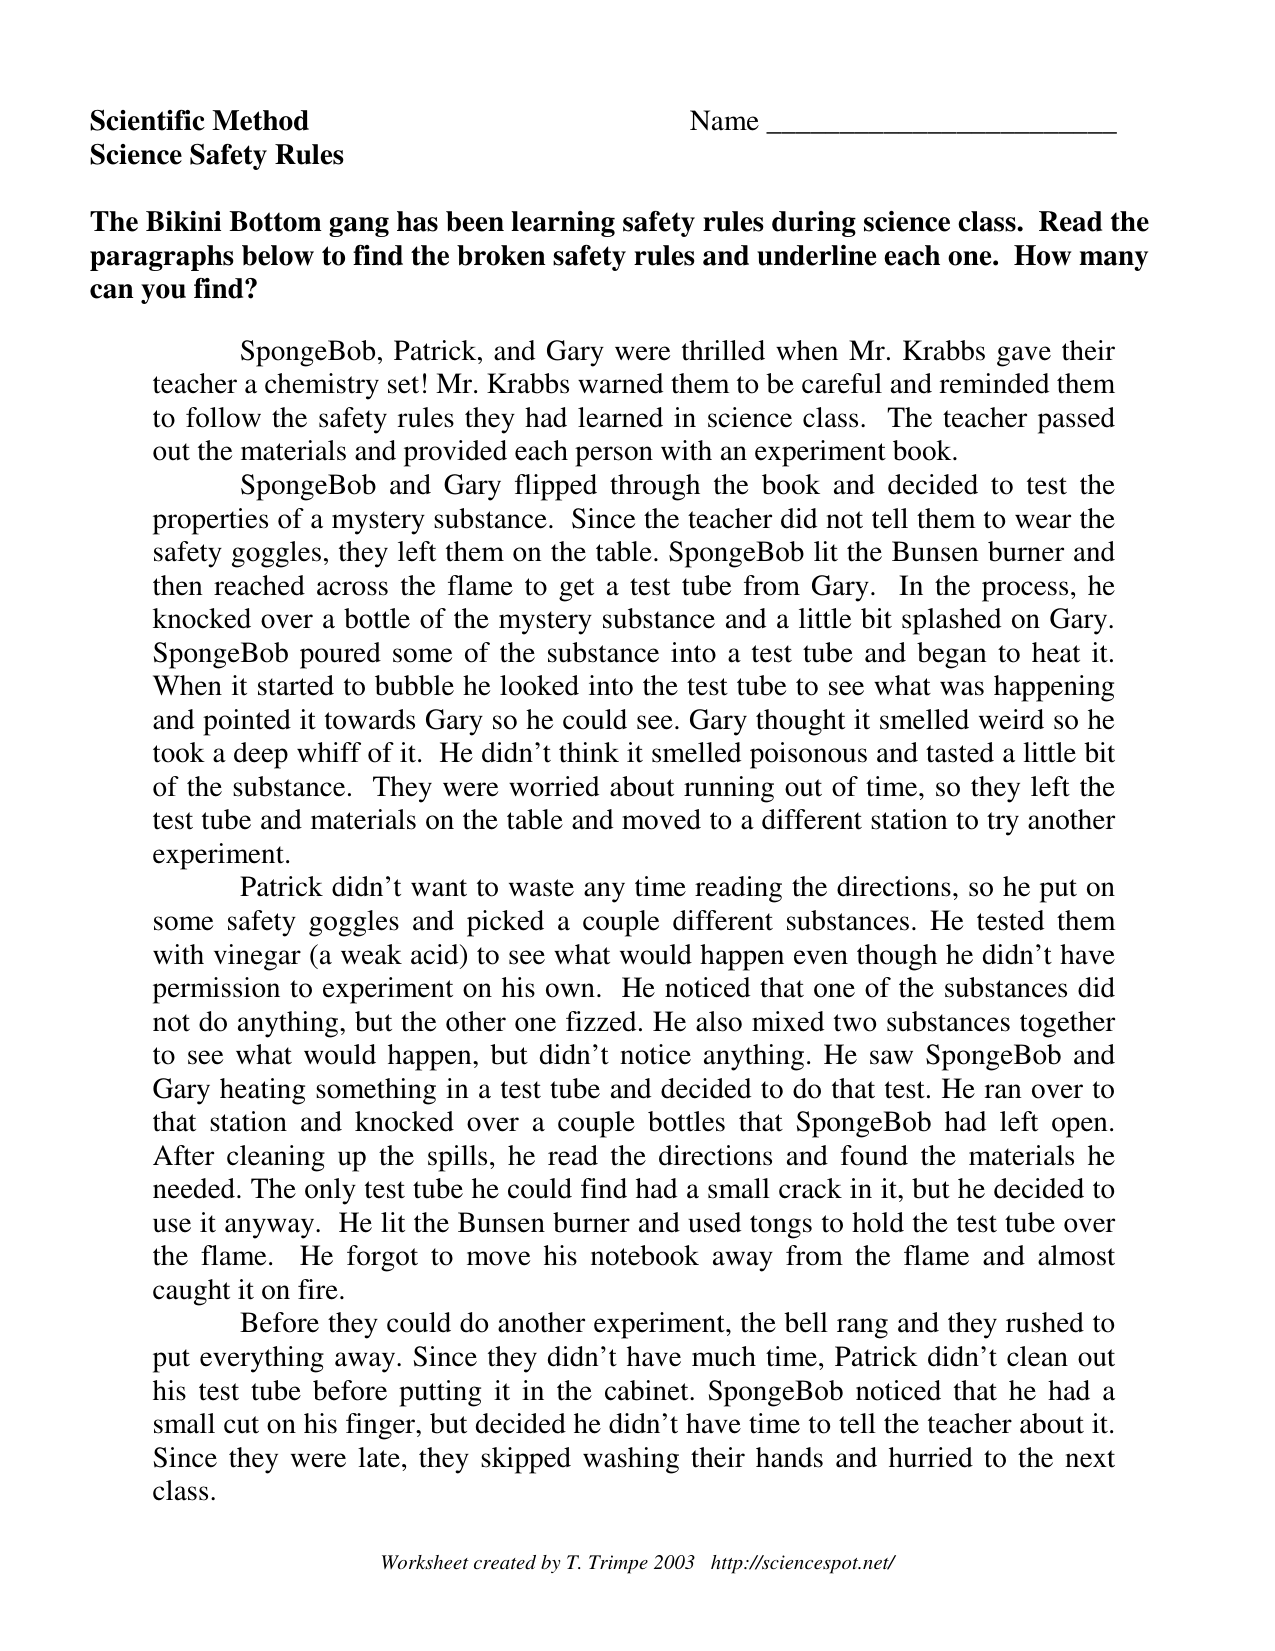 Worksheets Spongebob Science Worksheet 008117363 1 eefac3020c63e6202b3218f41e2ec913 png